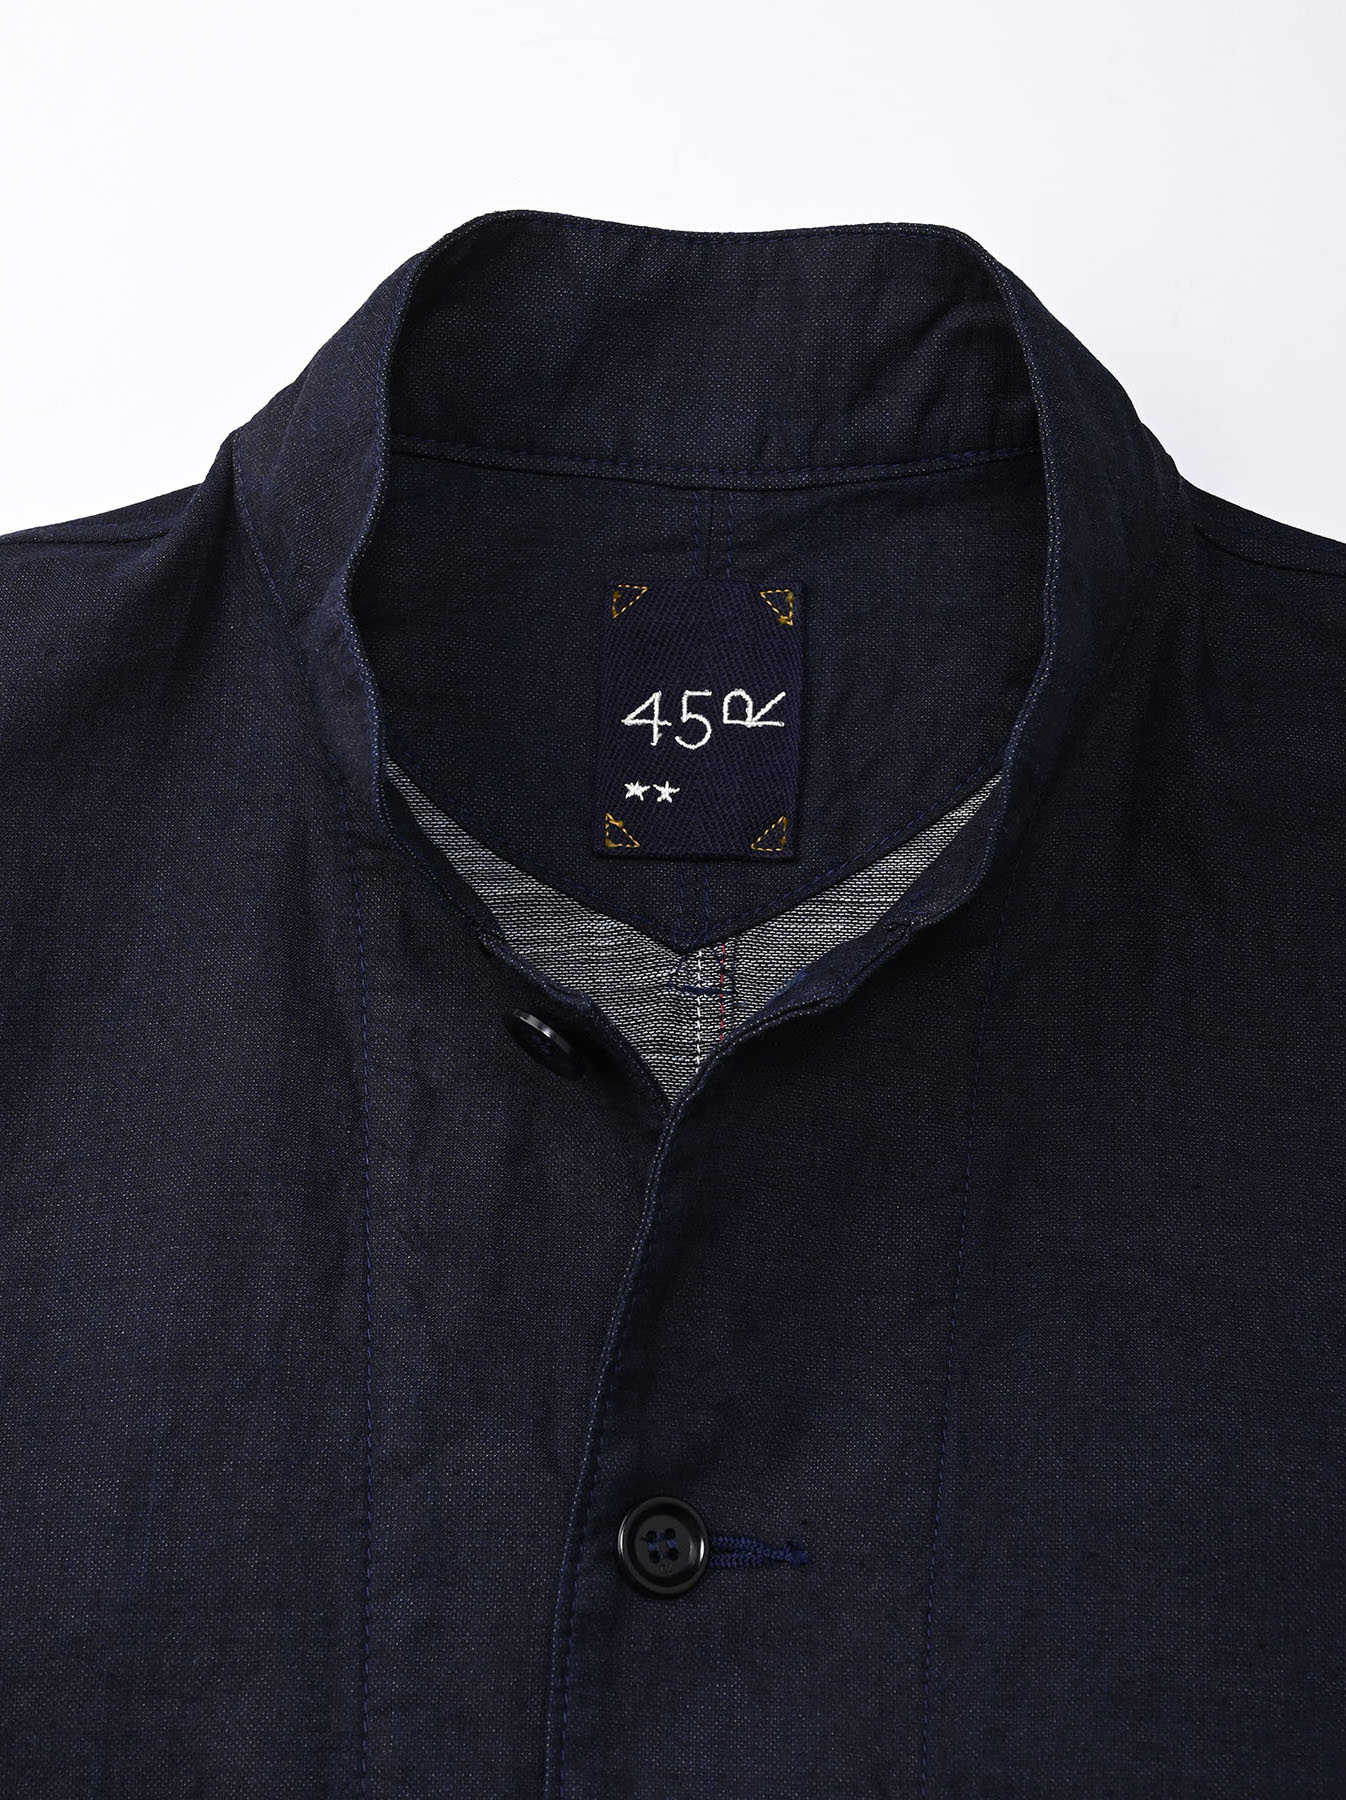 Indigo Double Woven 908 Shirt Jacket (0421)-7